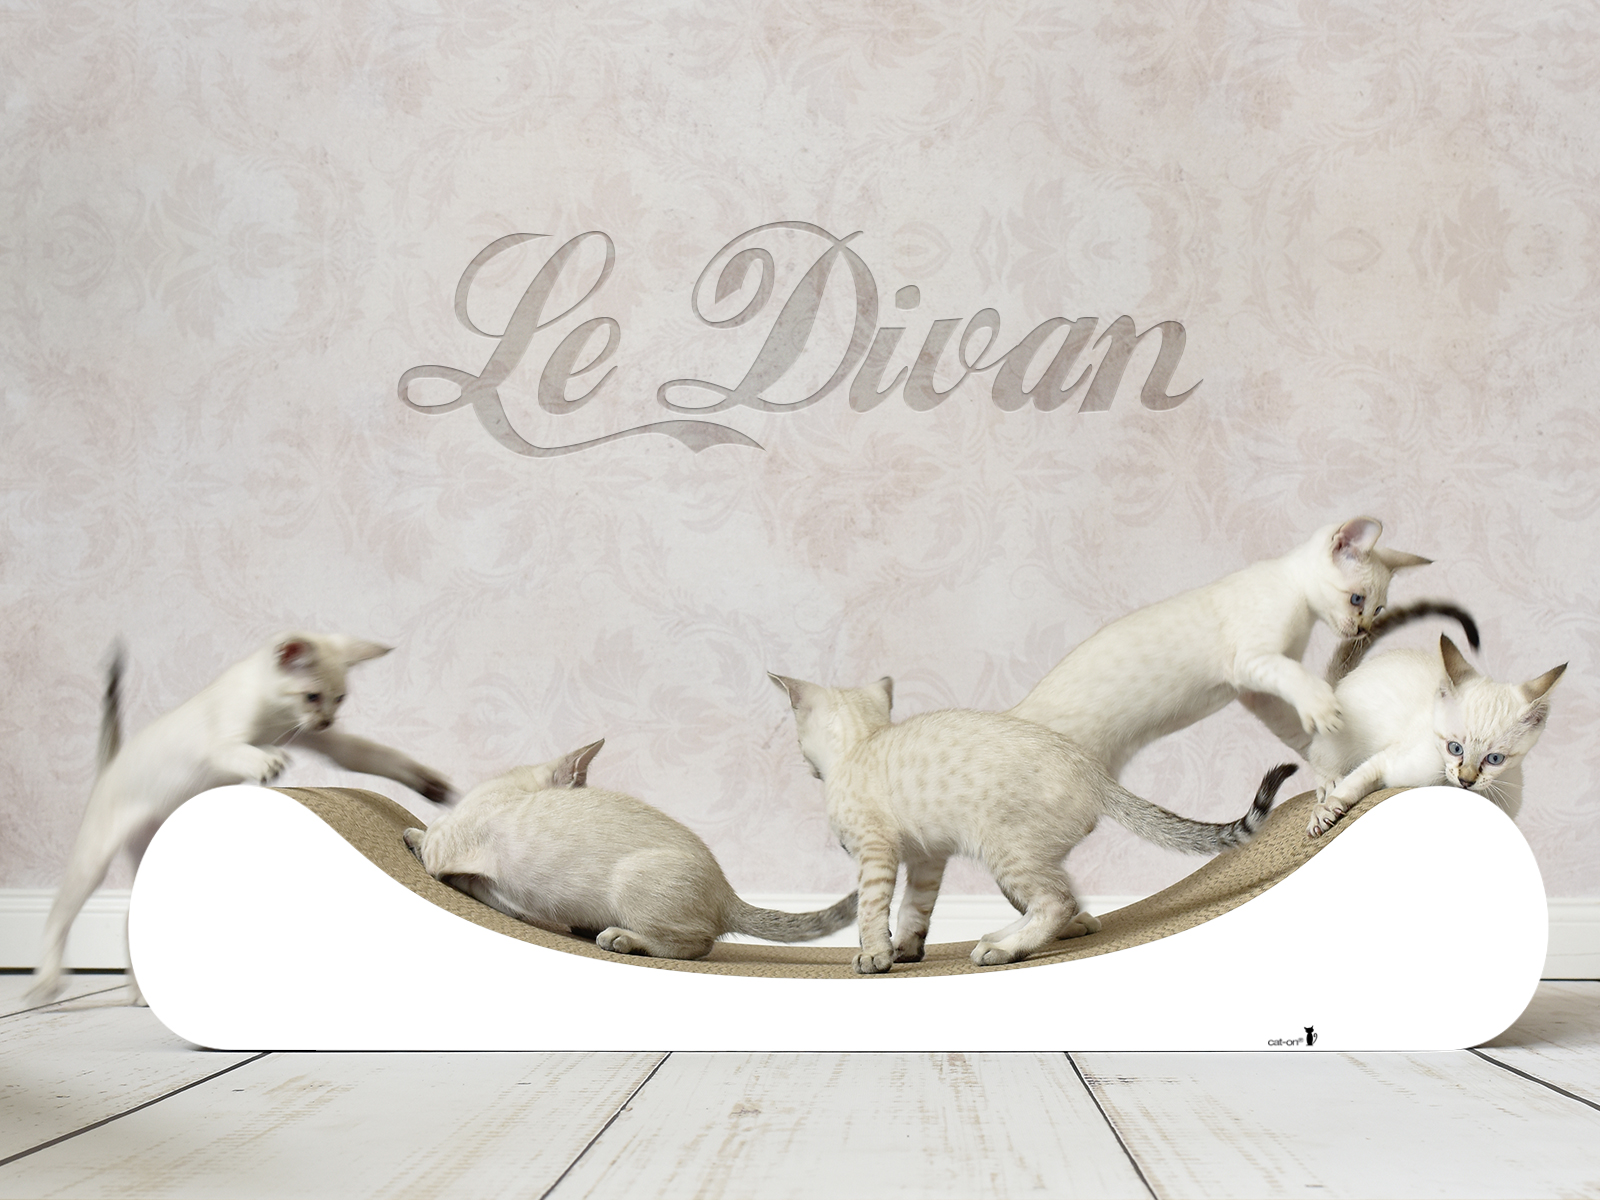 #000x - stylish design scratch post for cats Le Divan